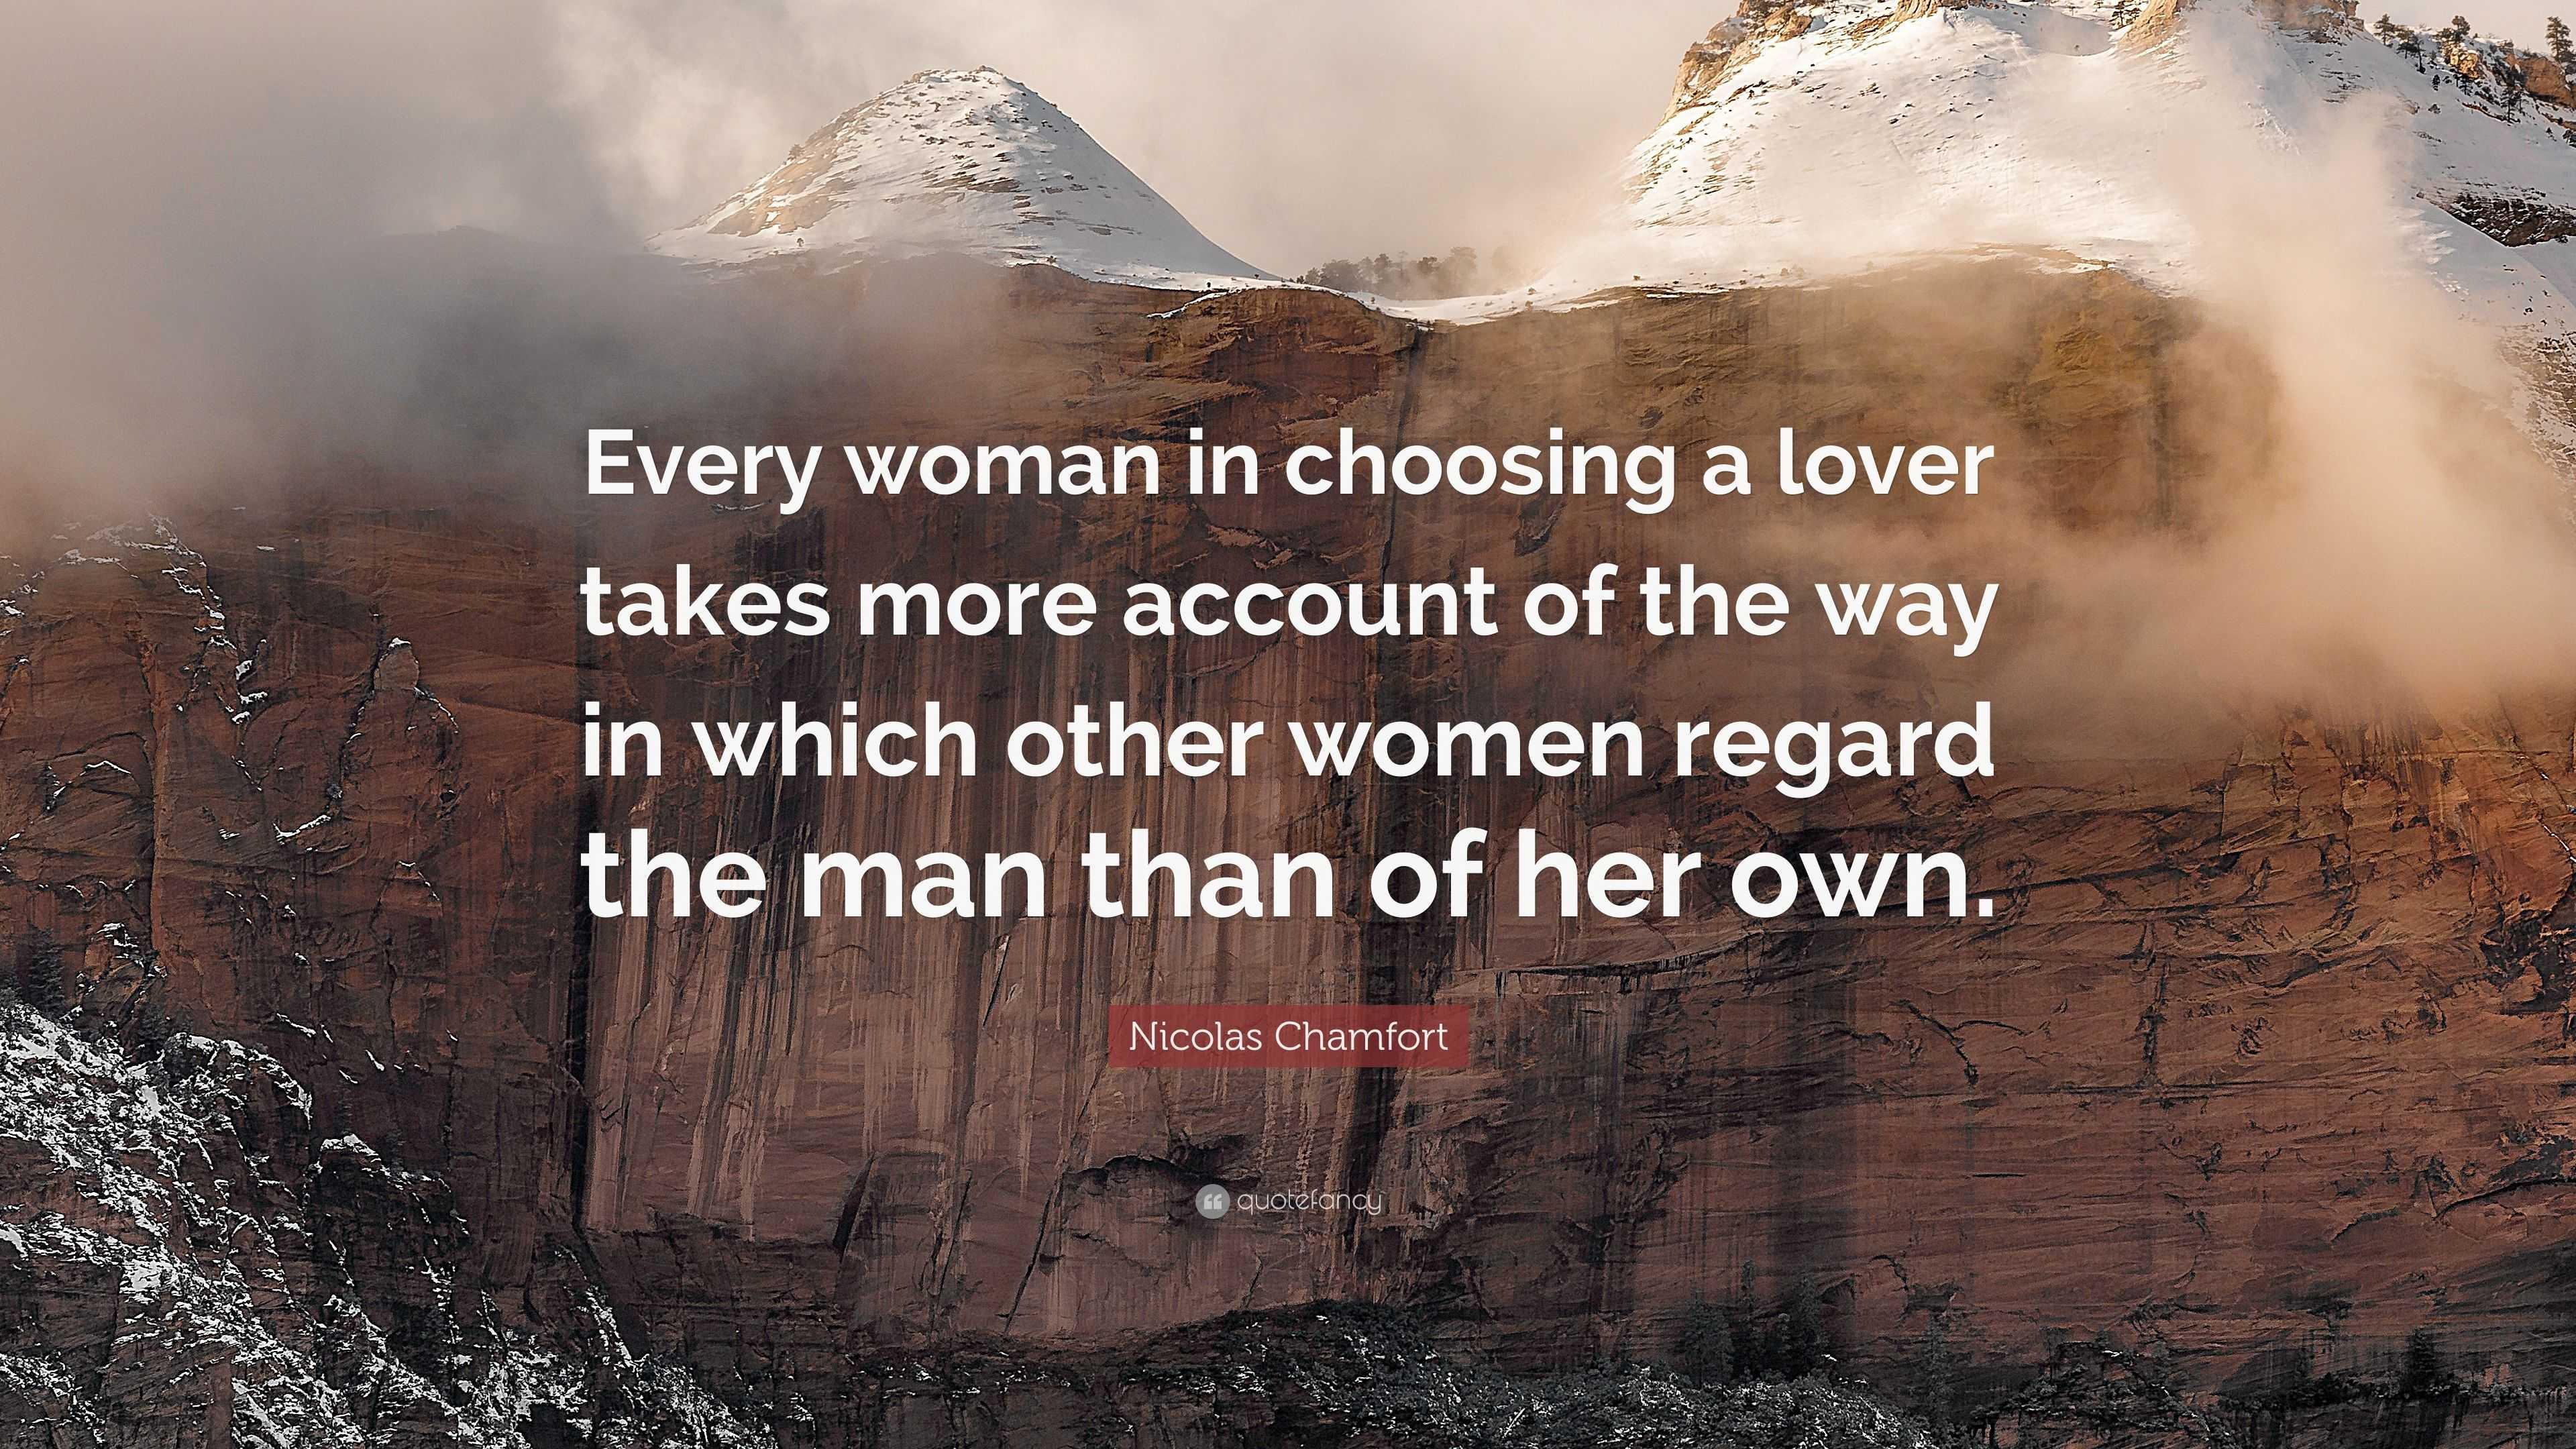 Choosing a lover